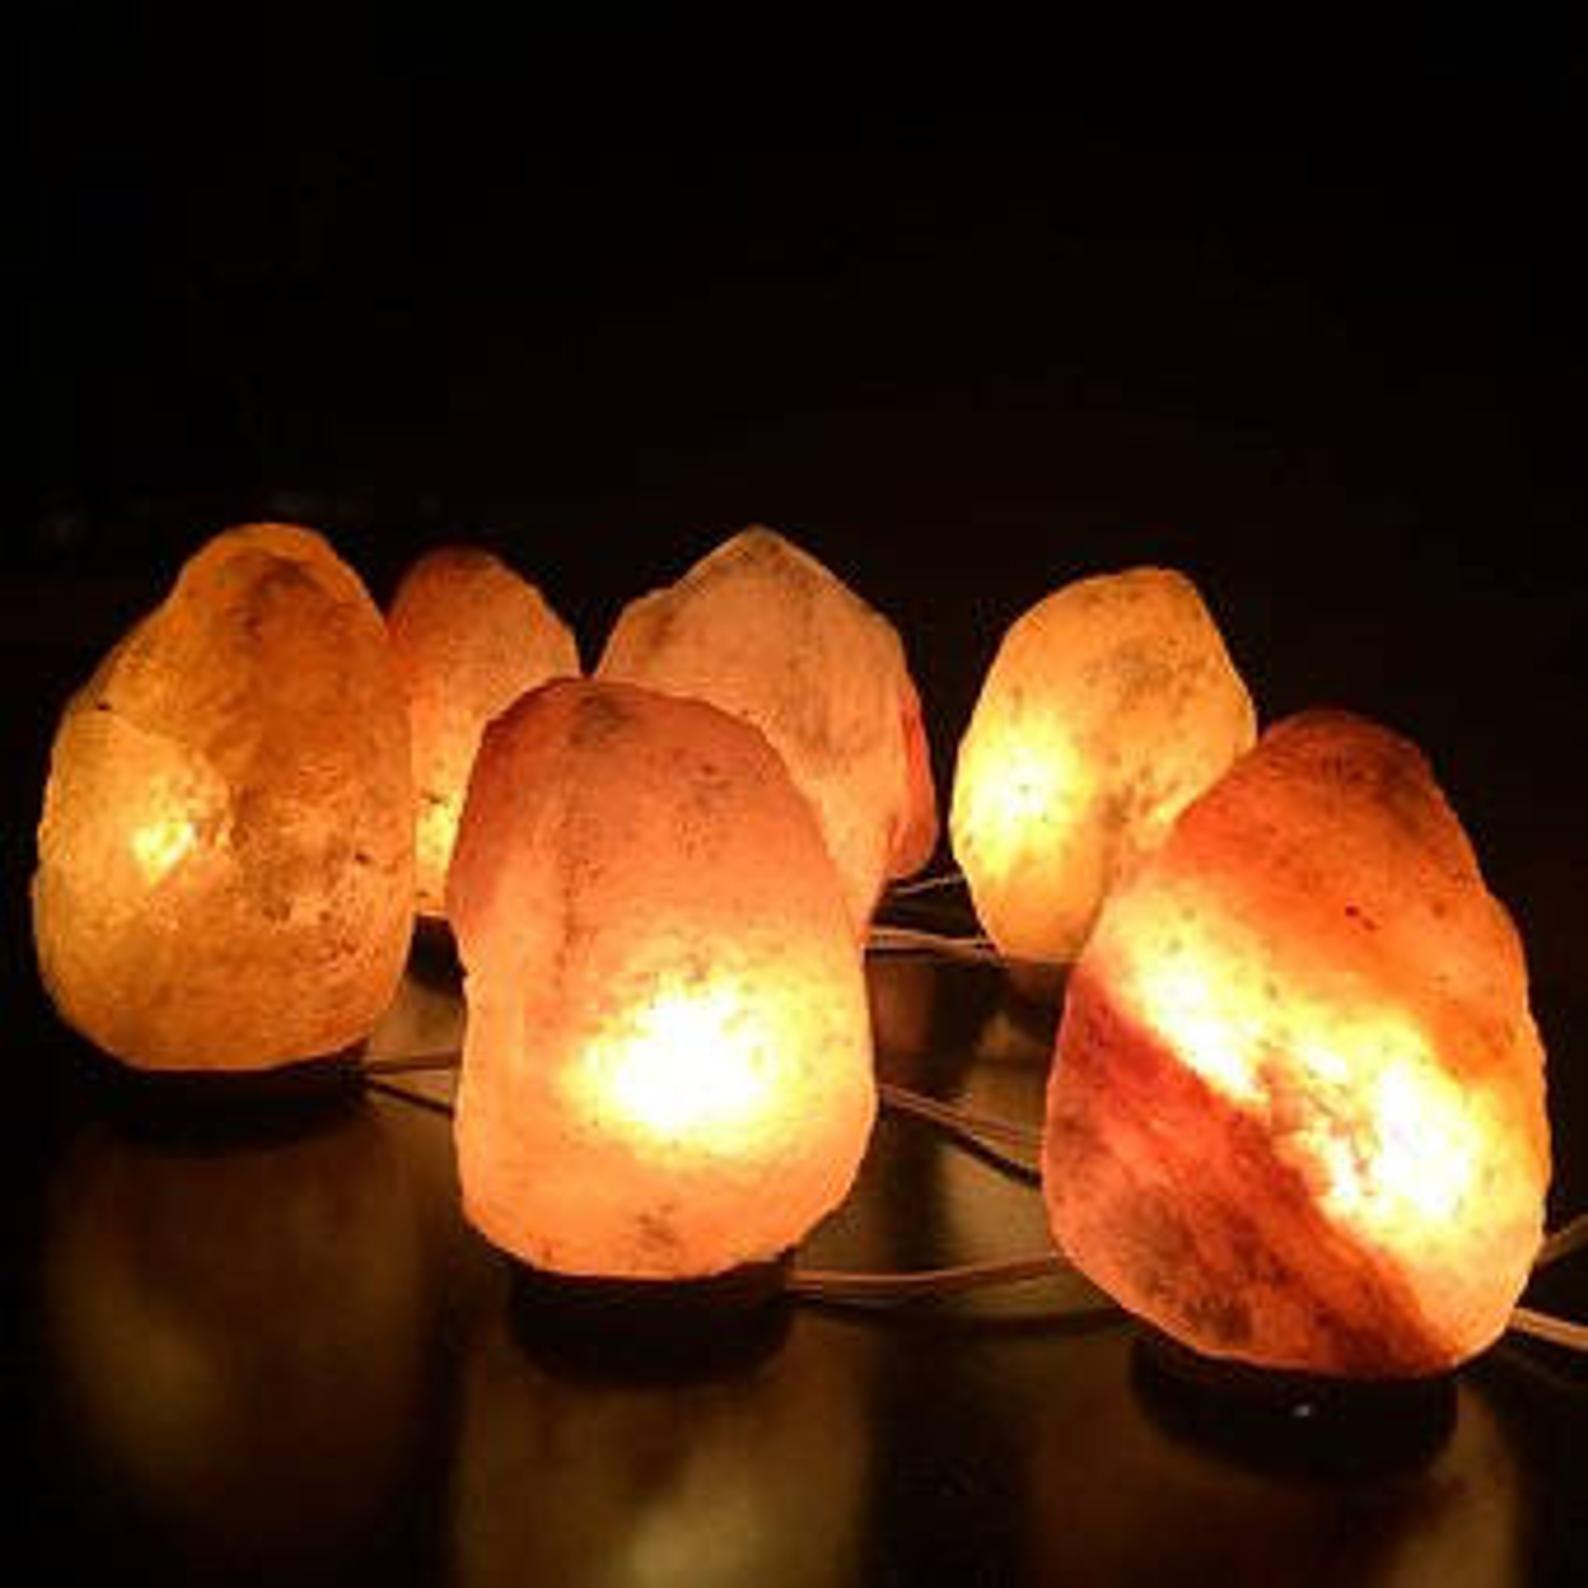 Rose De L Himalaya Ionisation Naturelle Lampe Cristal De Sel De